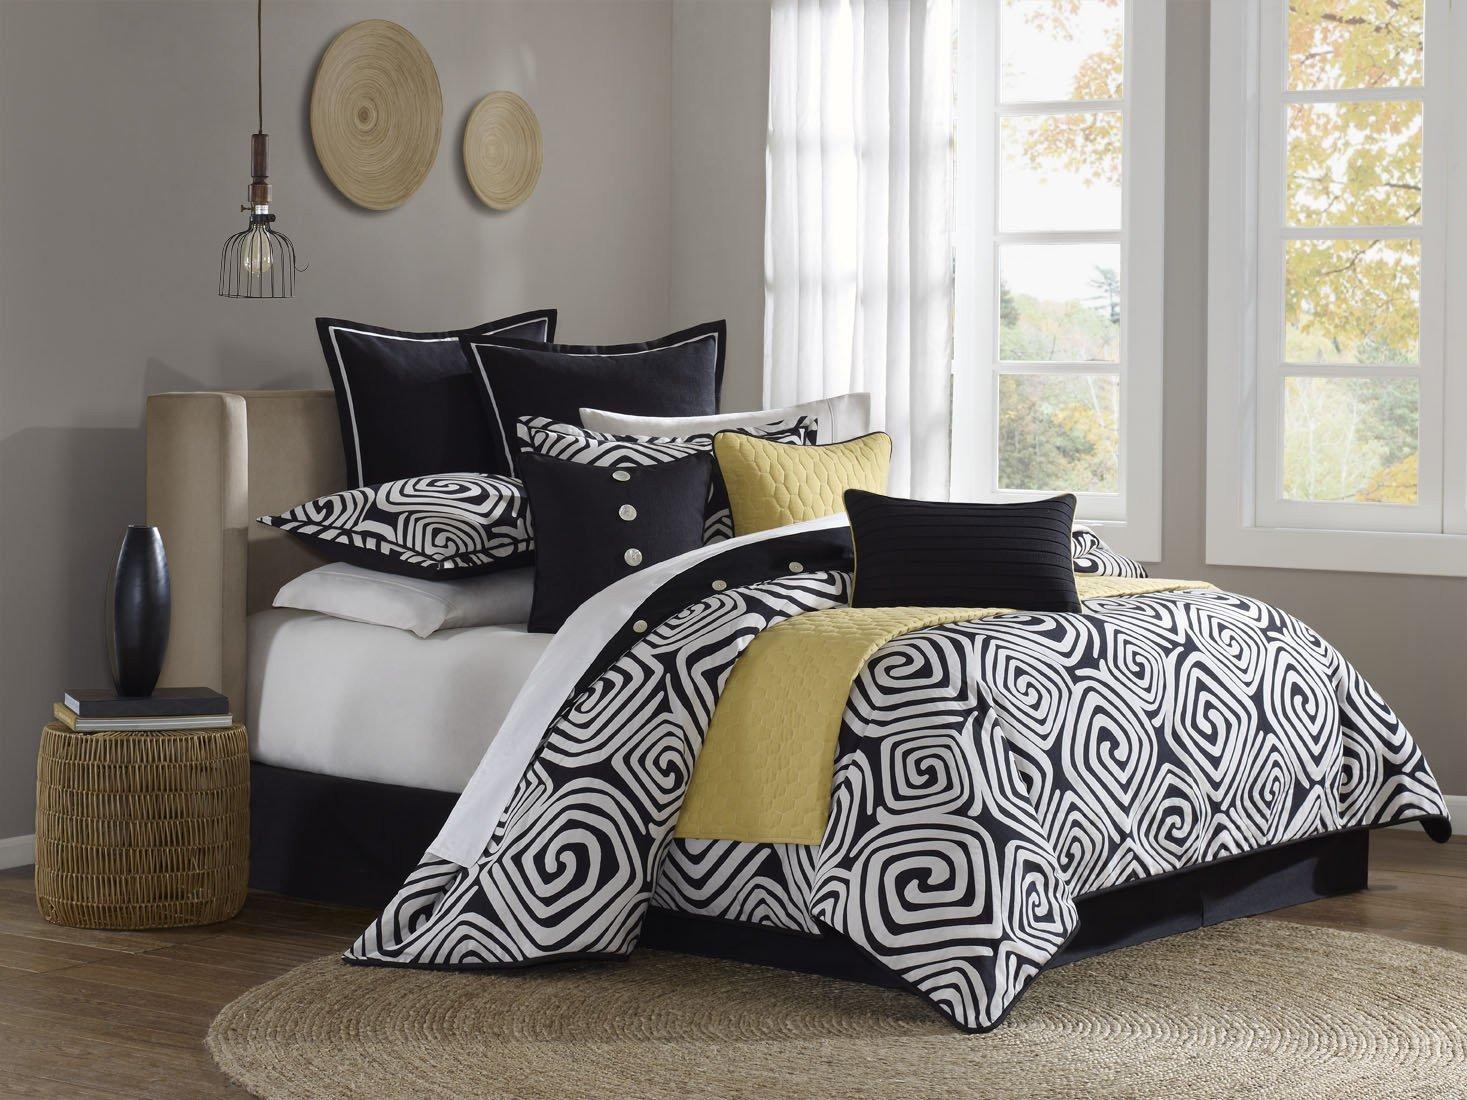 Black Bedroom Comforter Set New Hampton Hill Calypso Polyester Jacquard 9 Piece forter Set Queen Multi